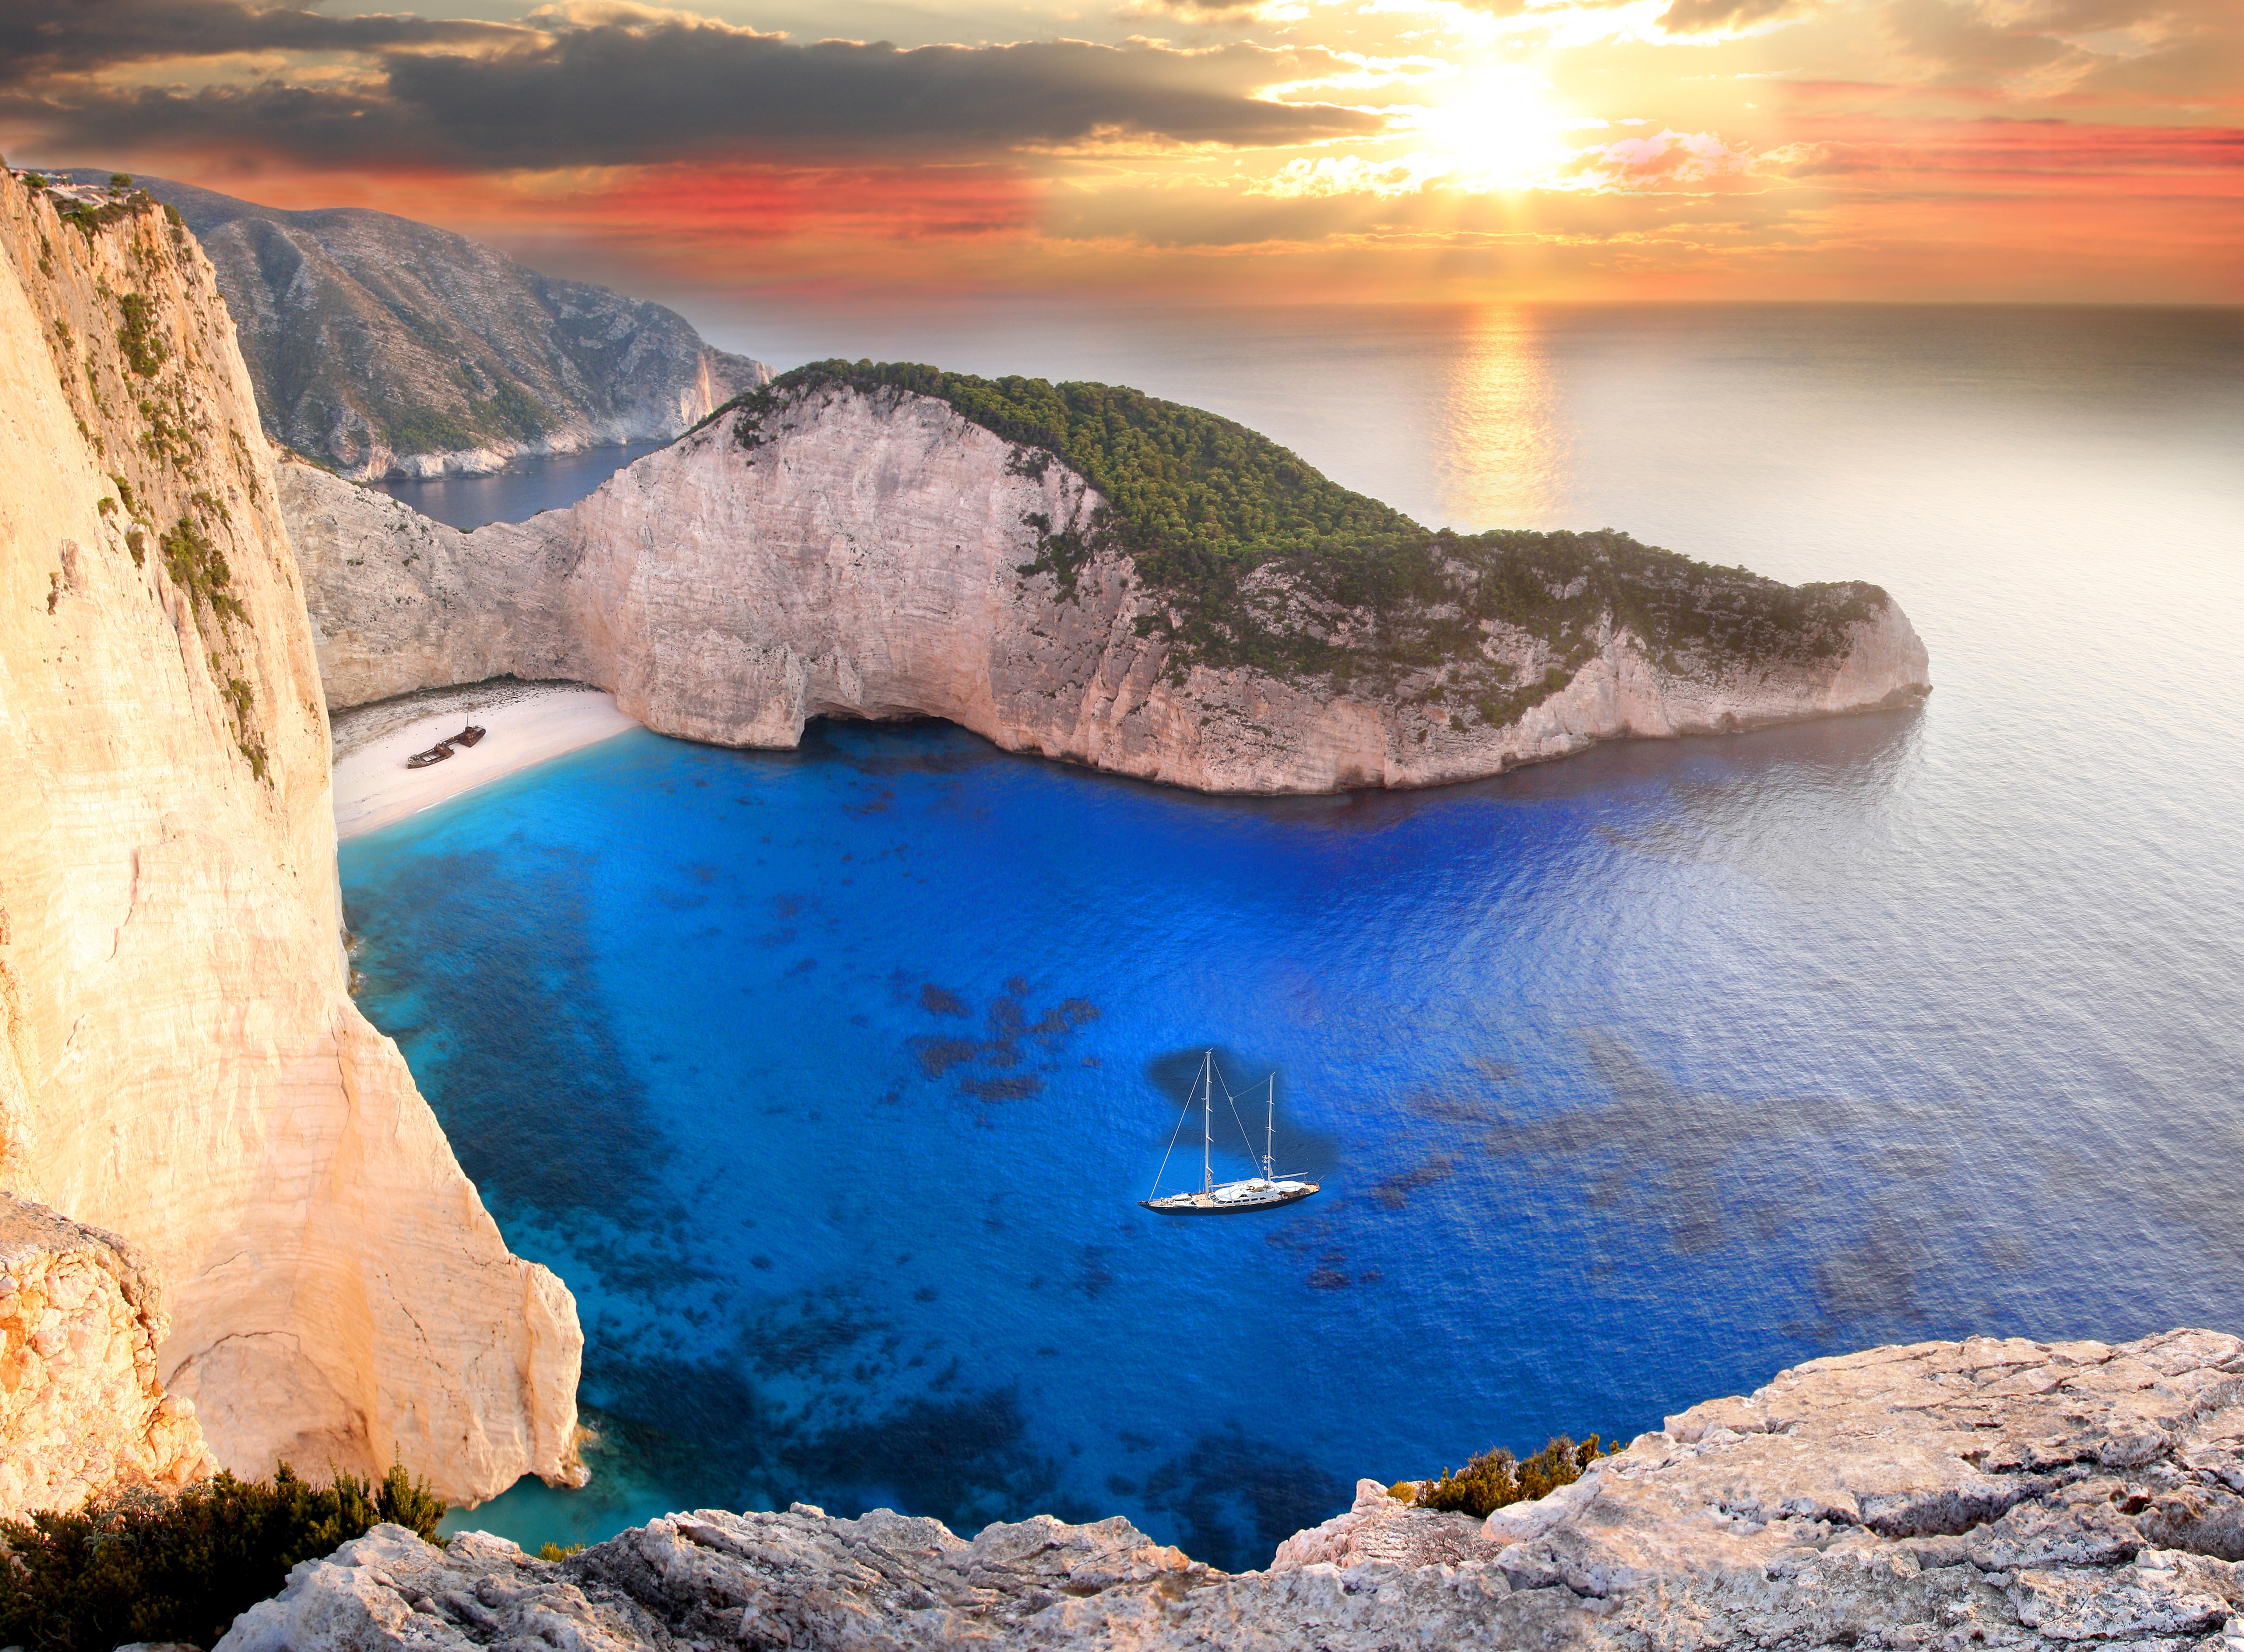 Shipwreck, Navagio beach, Zakynthos